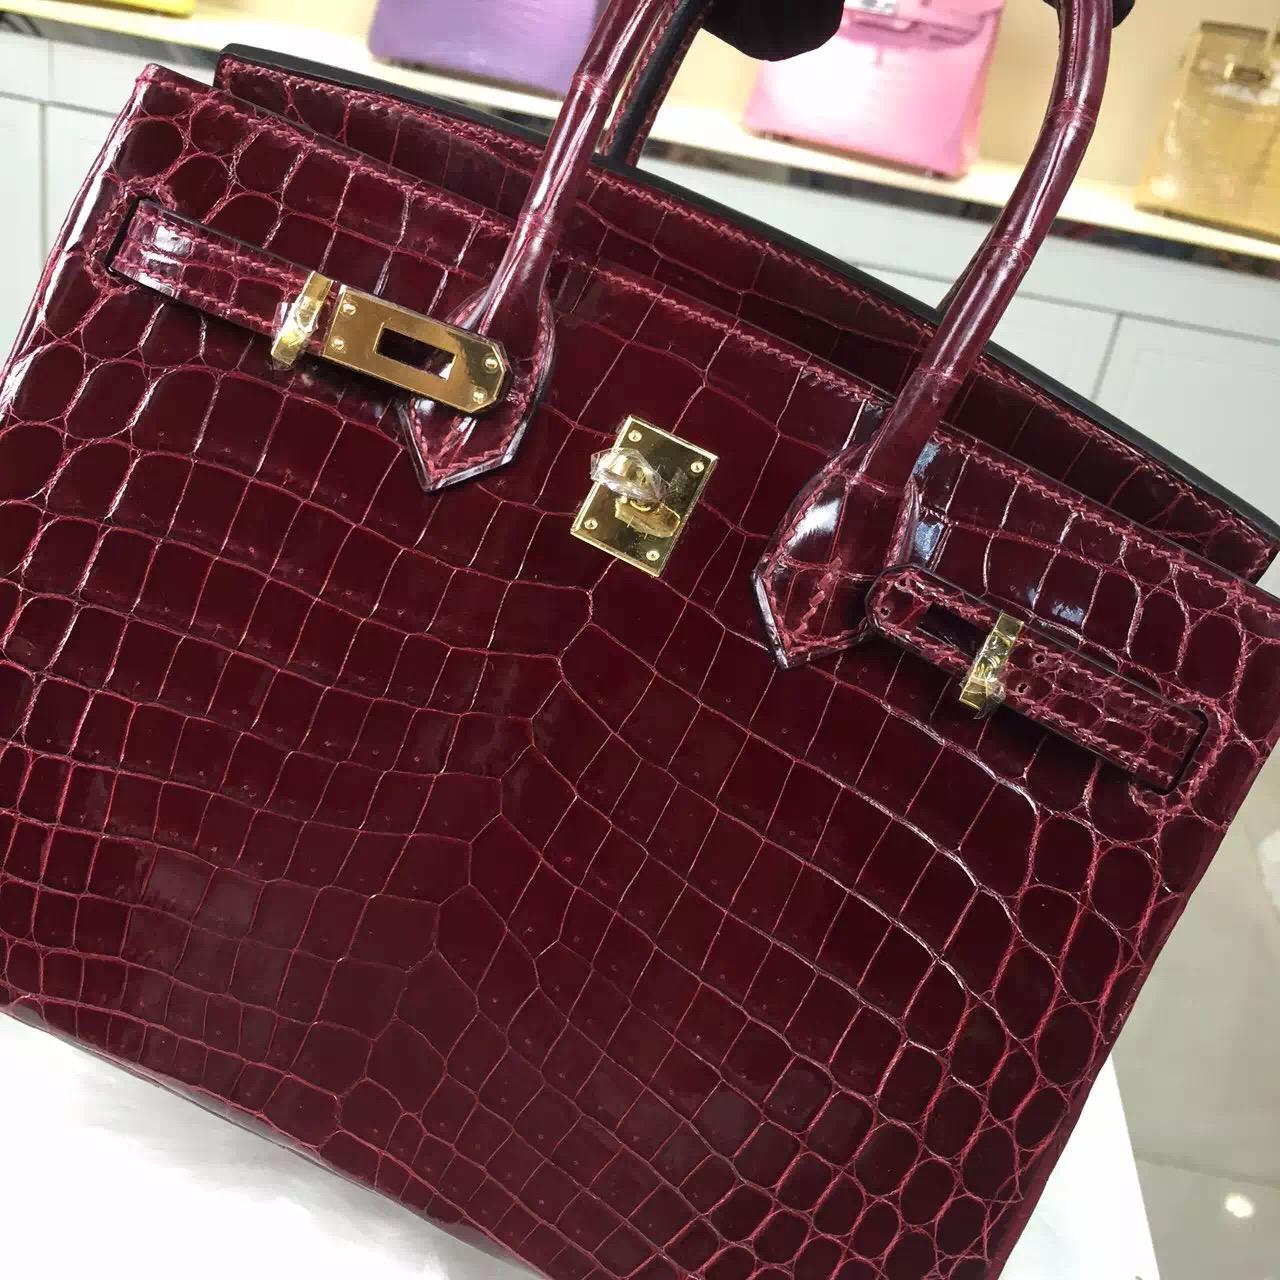 Luxury Women's Bag Hermes Birkin Bag 25CM F5 Bourgogne Red Crocodile Leather